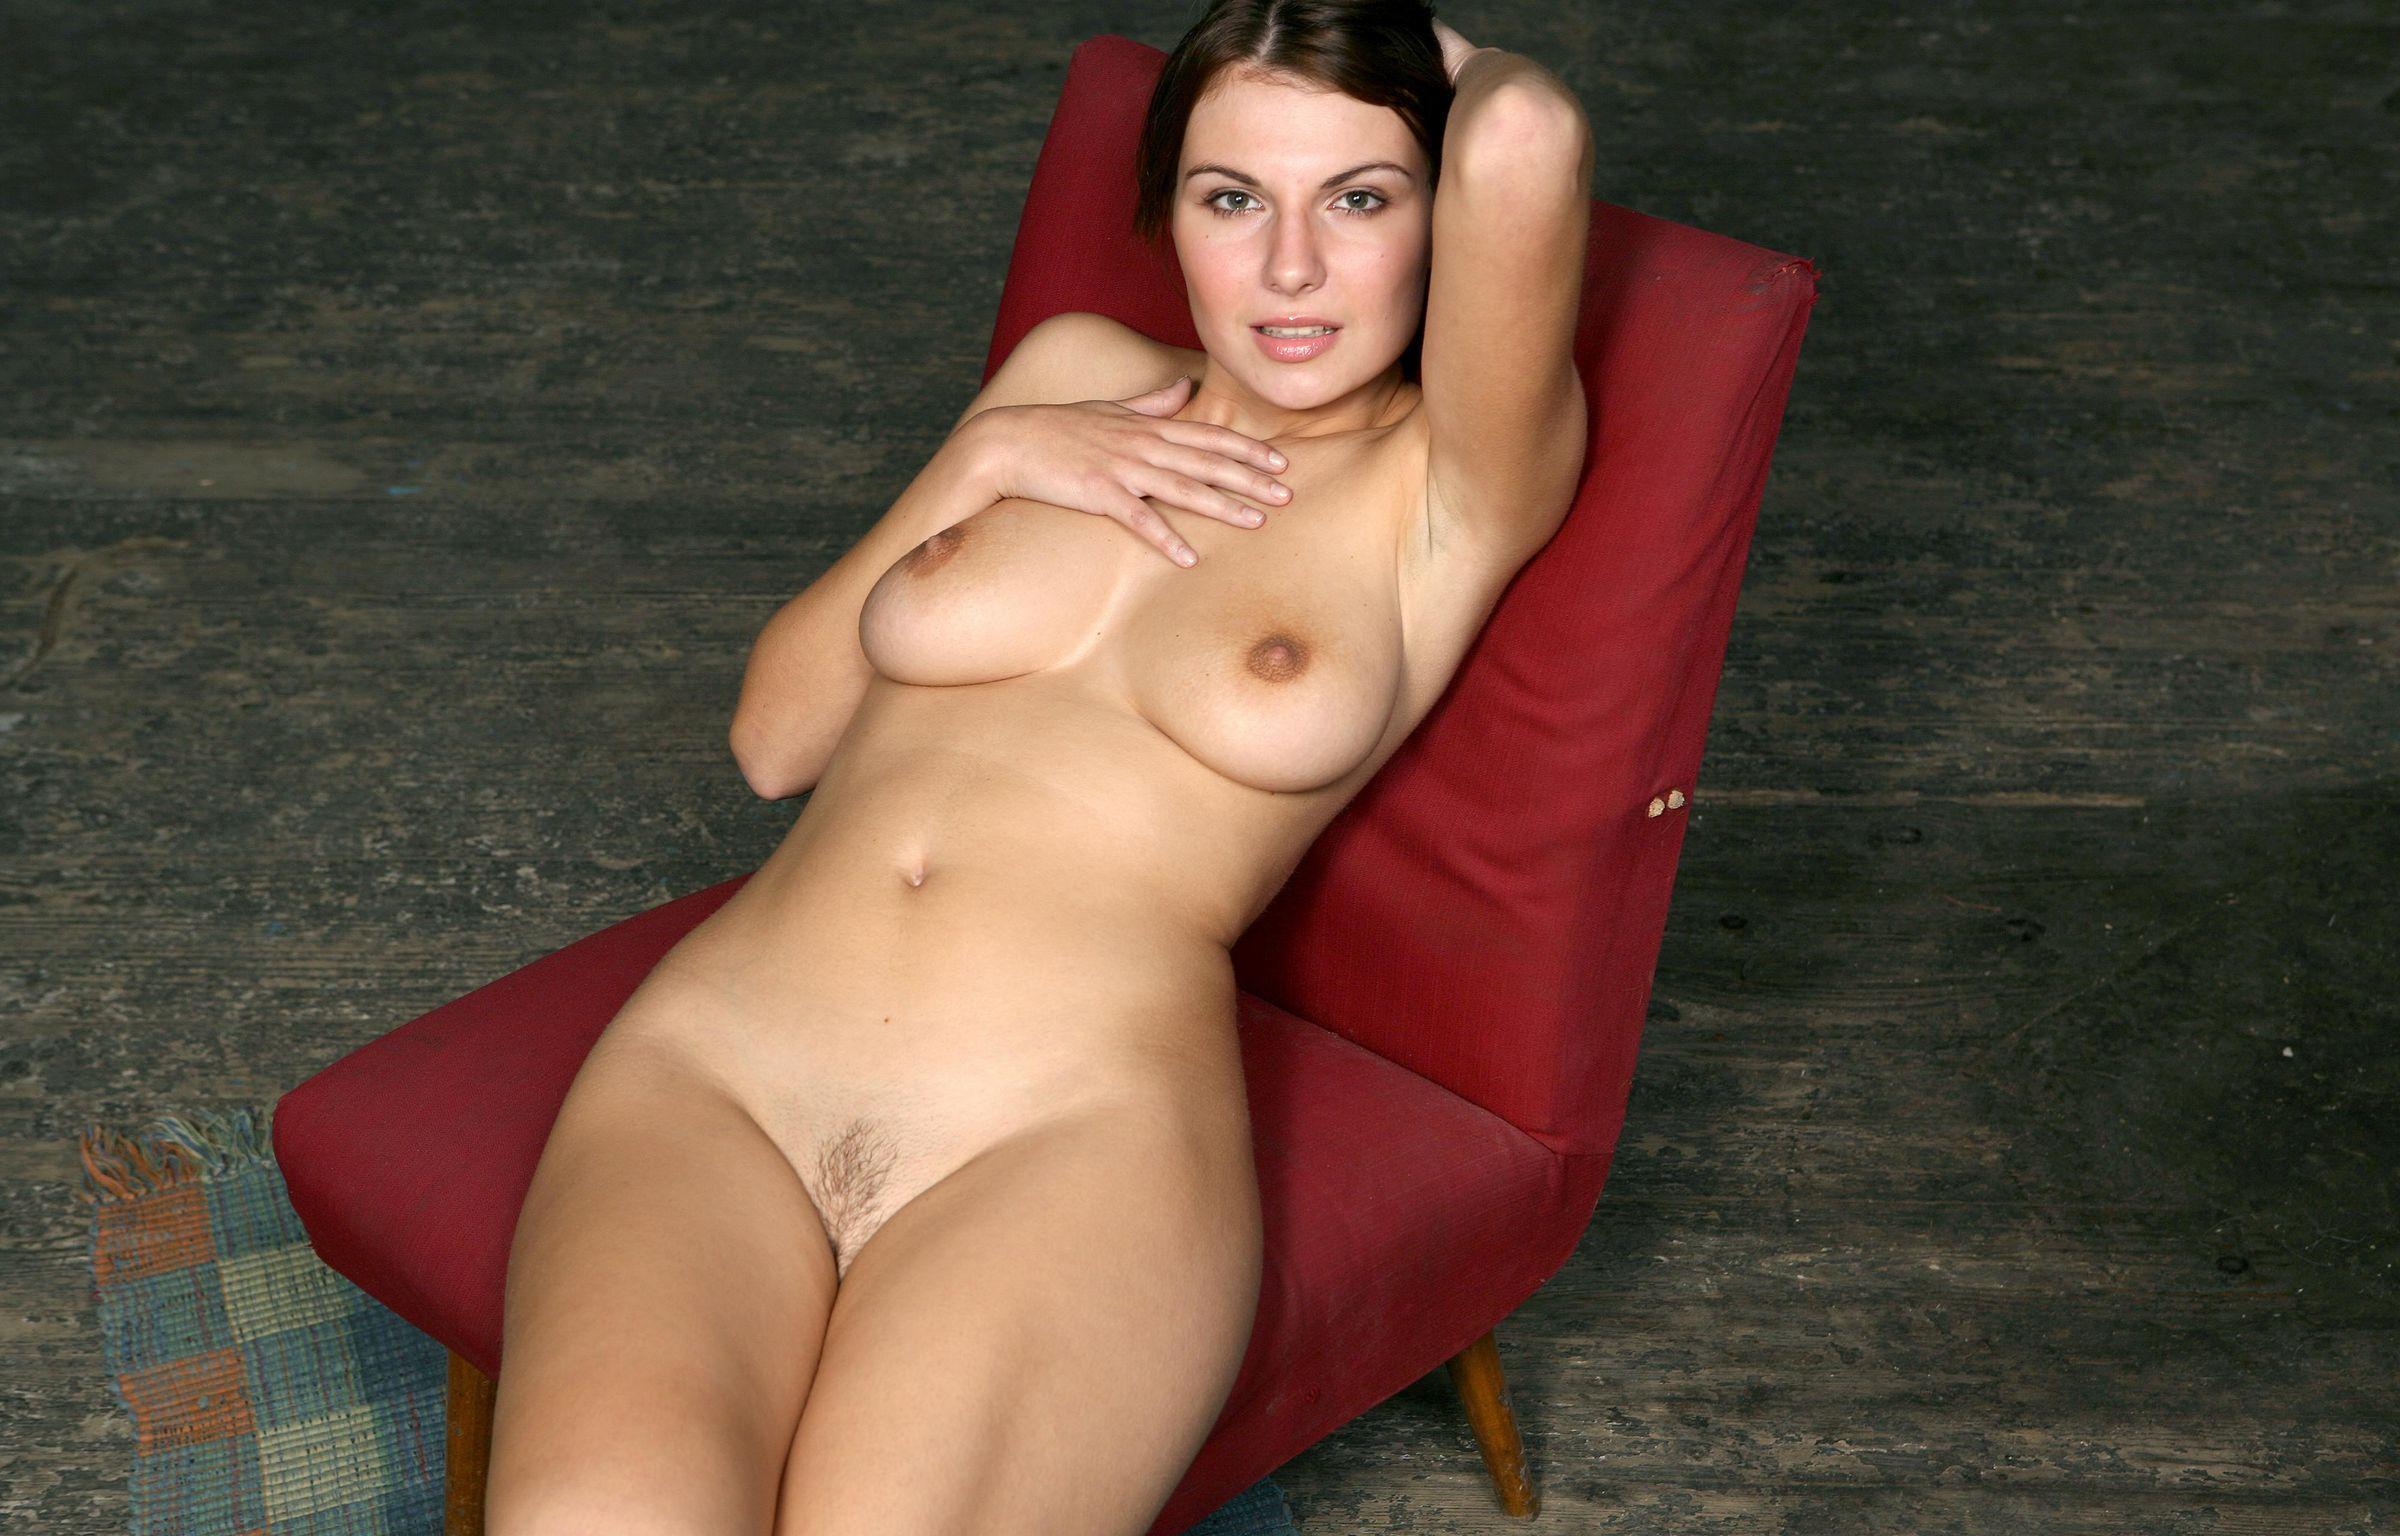 Laura marino naked, harem women nudes